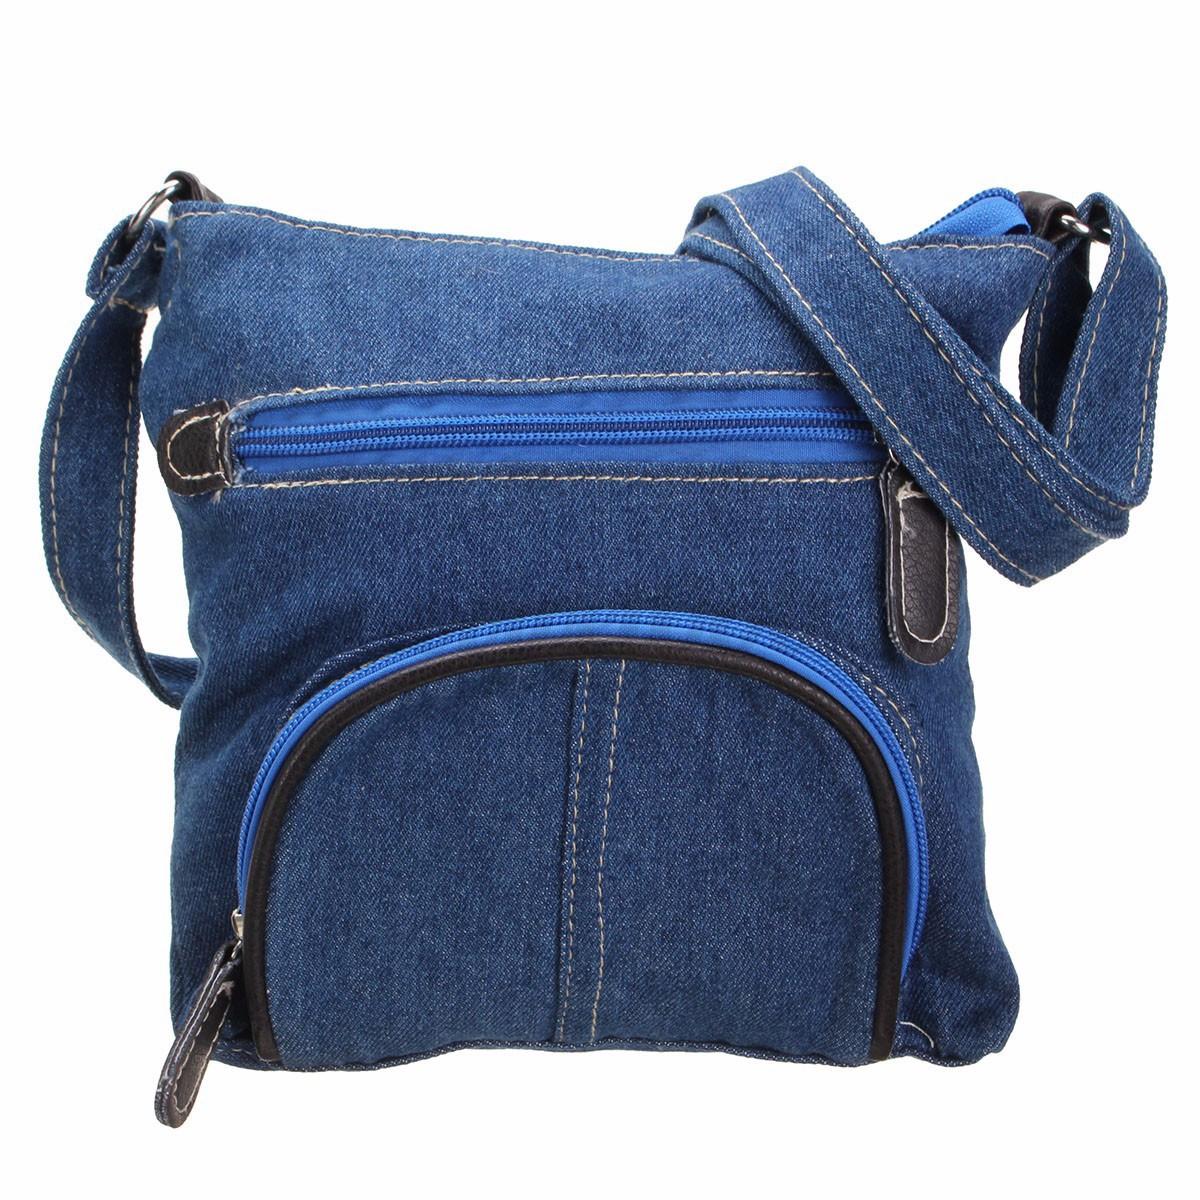 Denim Ladies Women Messenger Crossbody Shoulder Bag Handbag Tote Purse Satchel | eBay